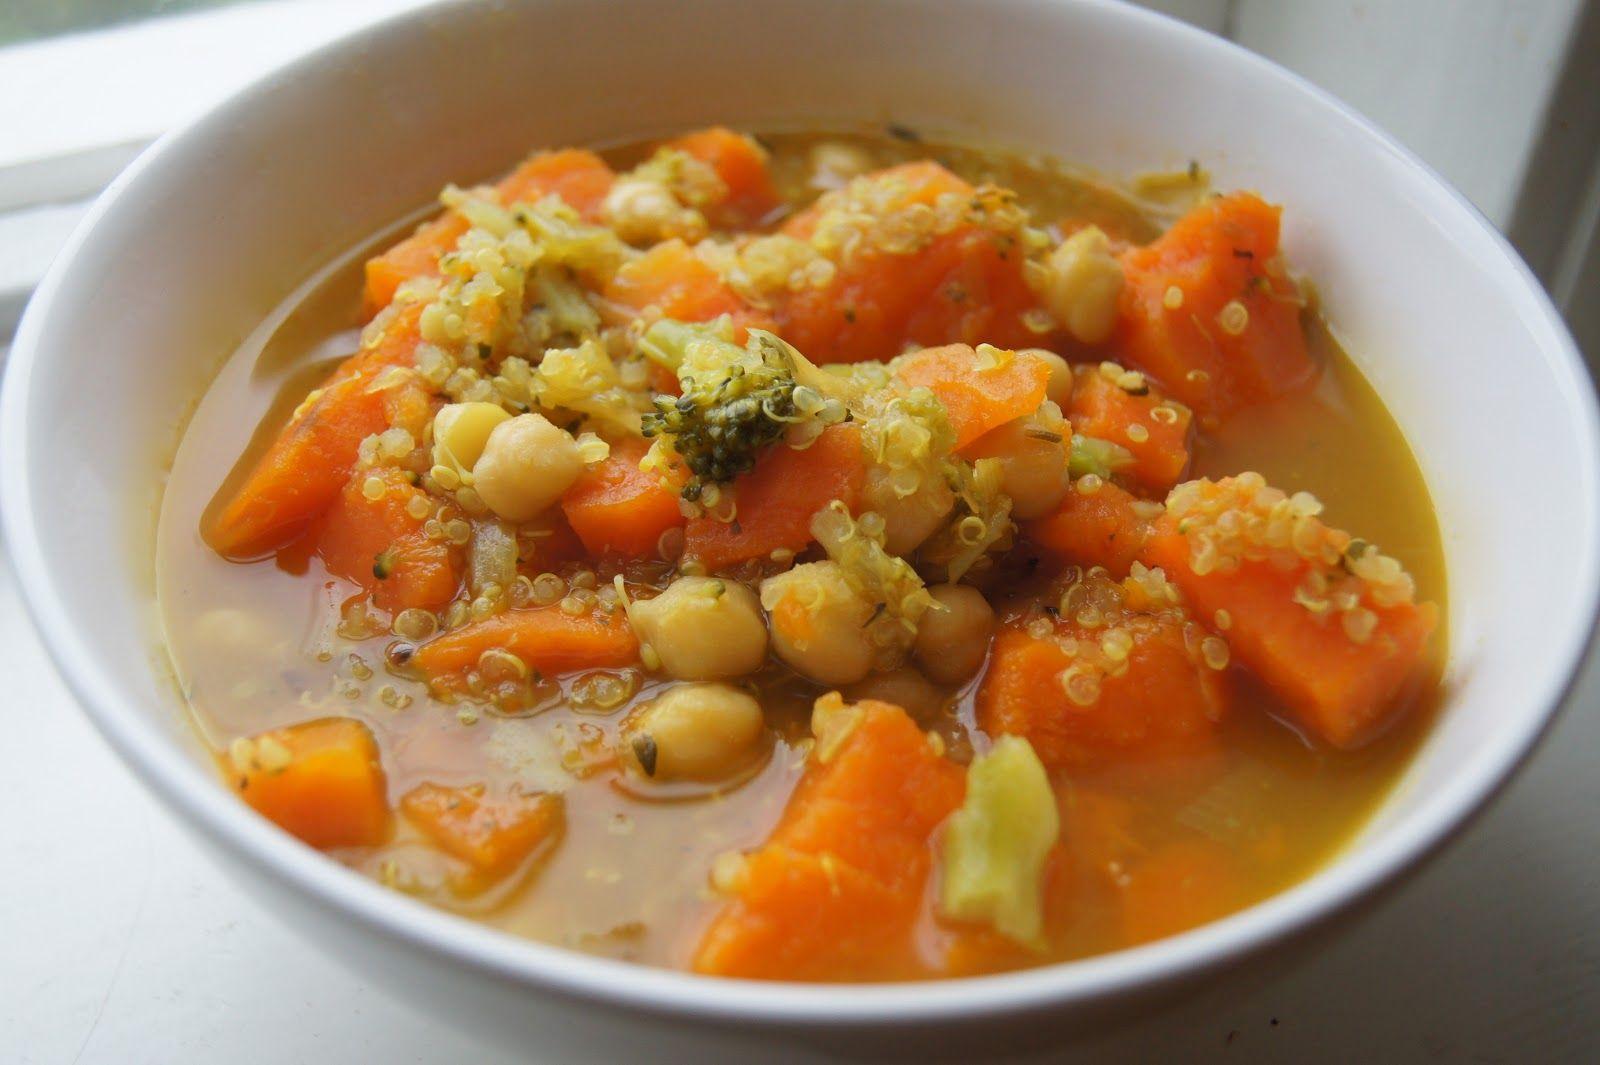 Pin by Tifftm on Vegetarian/vegan recipes | Pinterest